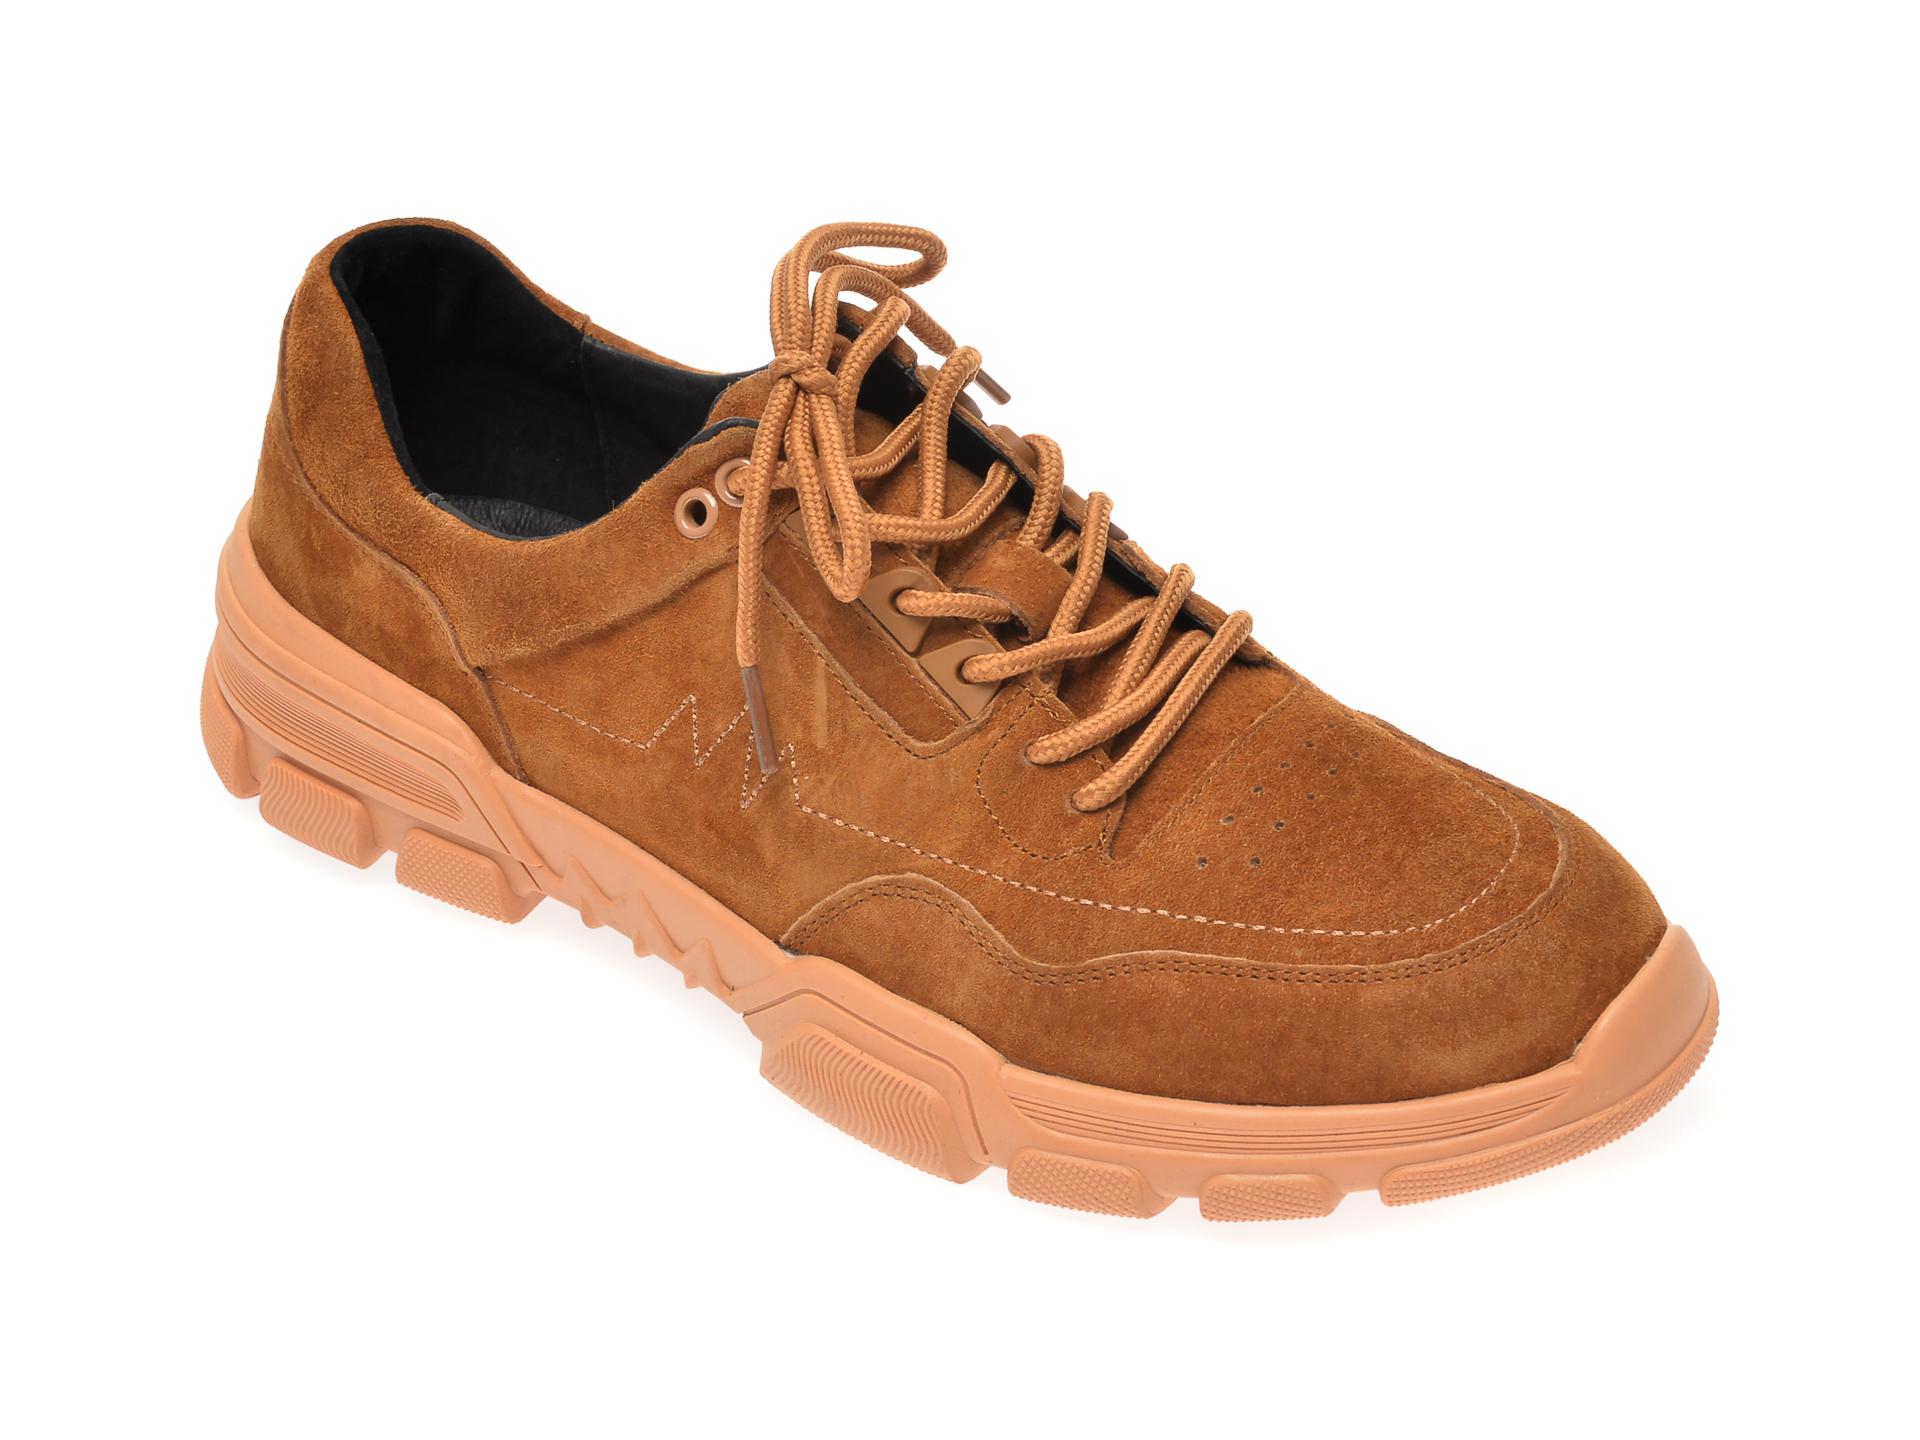 Pantofi Otter Maro, Y93651, Din Nabuc